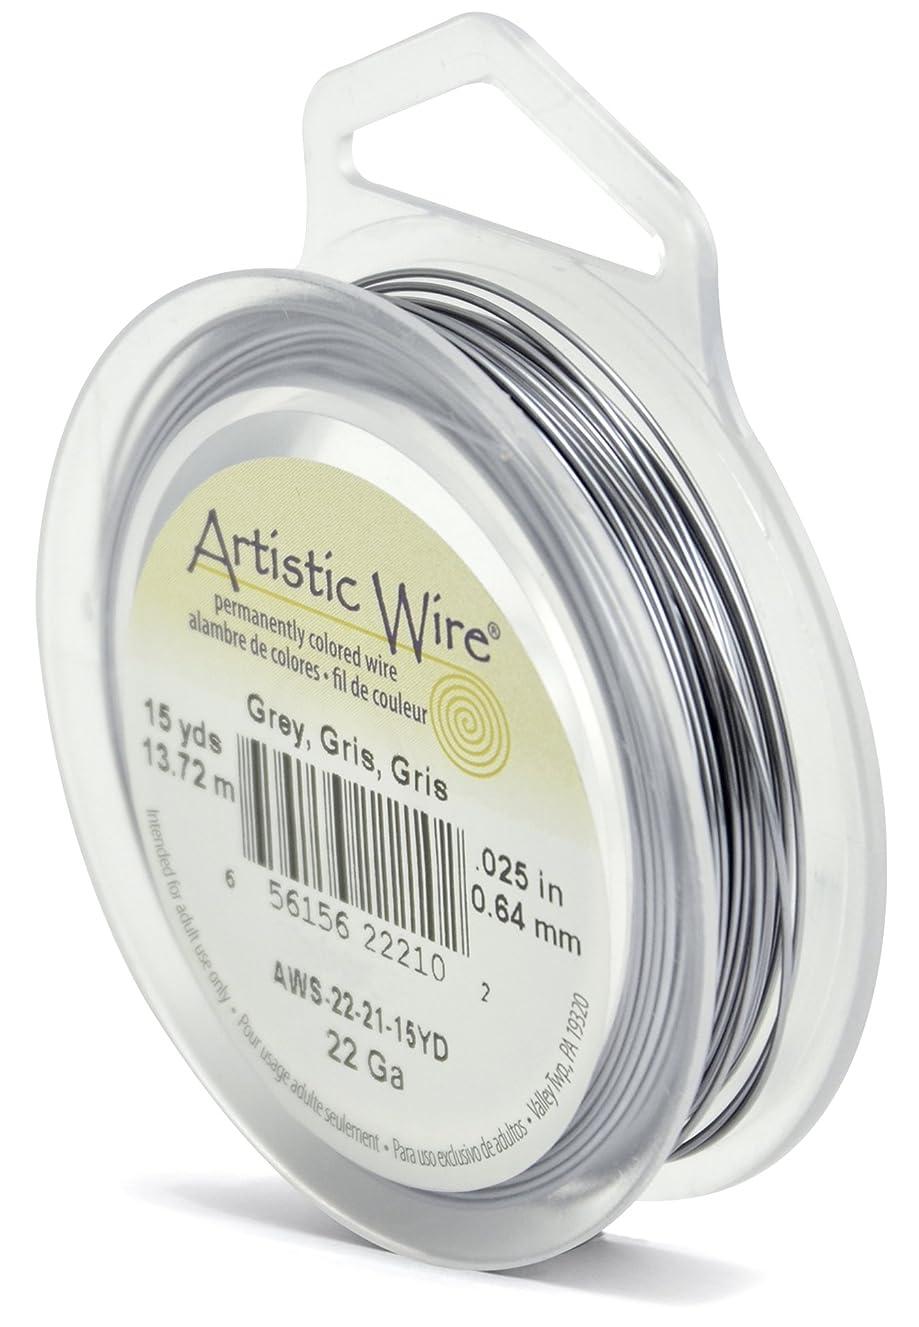 Beadalon Artistic Wire 22-Gauge Grey Wire, 15-Yards